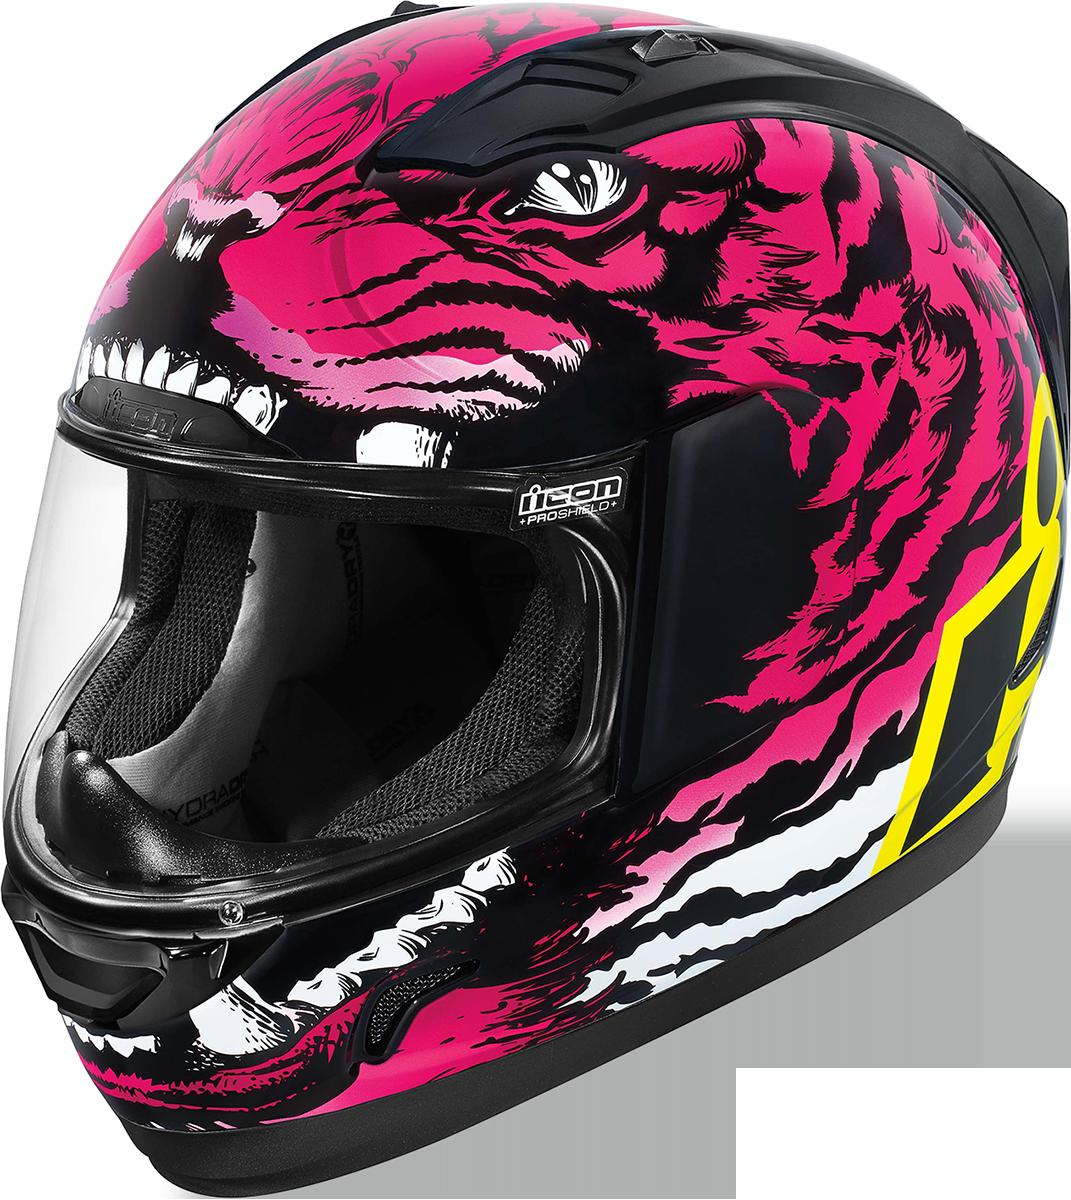 Icon Alliance Berserker DOT Fullface Large Motorcycle Riding Street Helmet